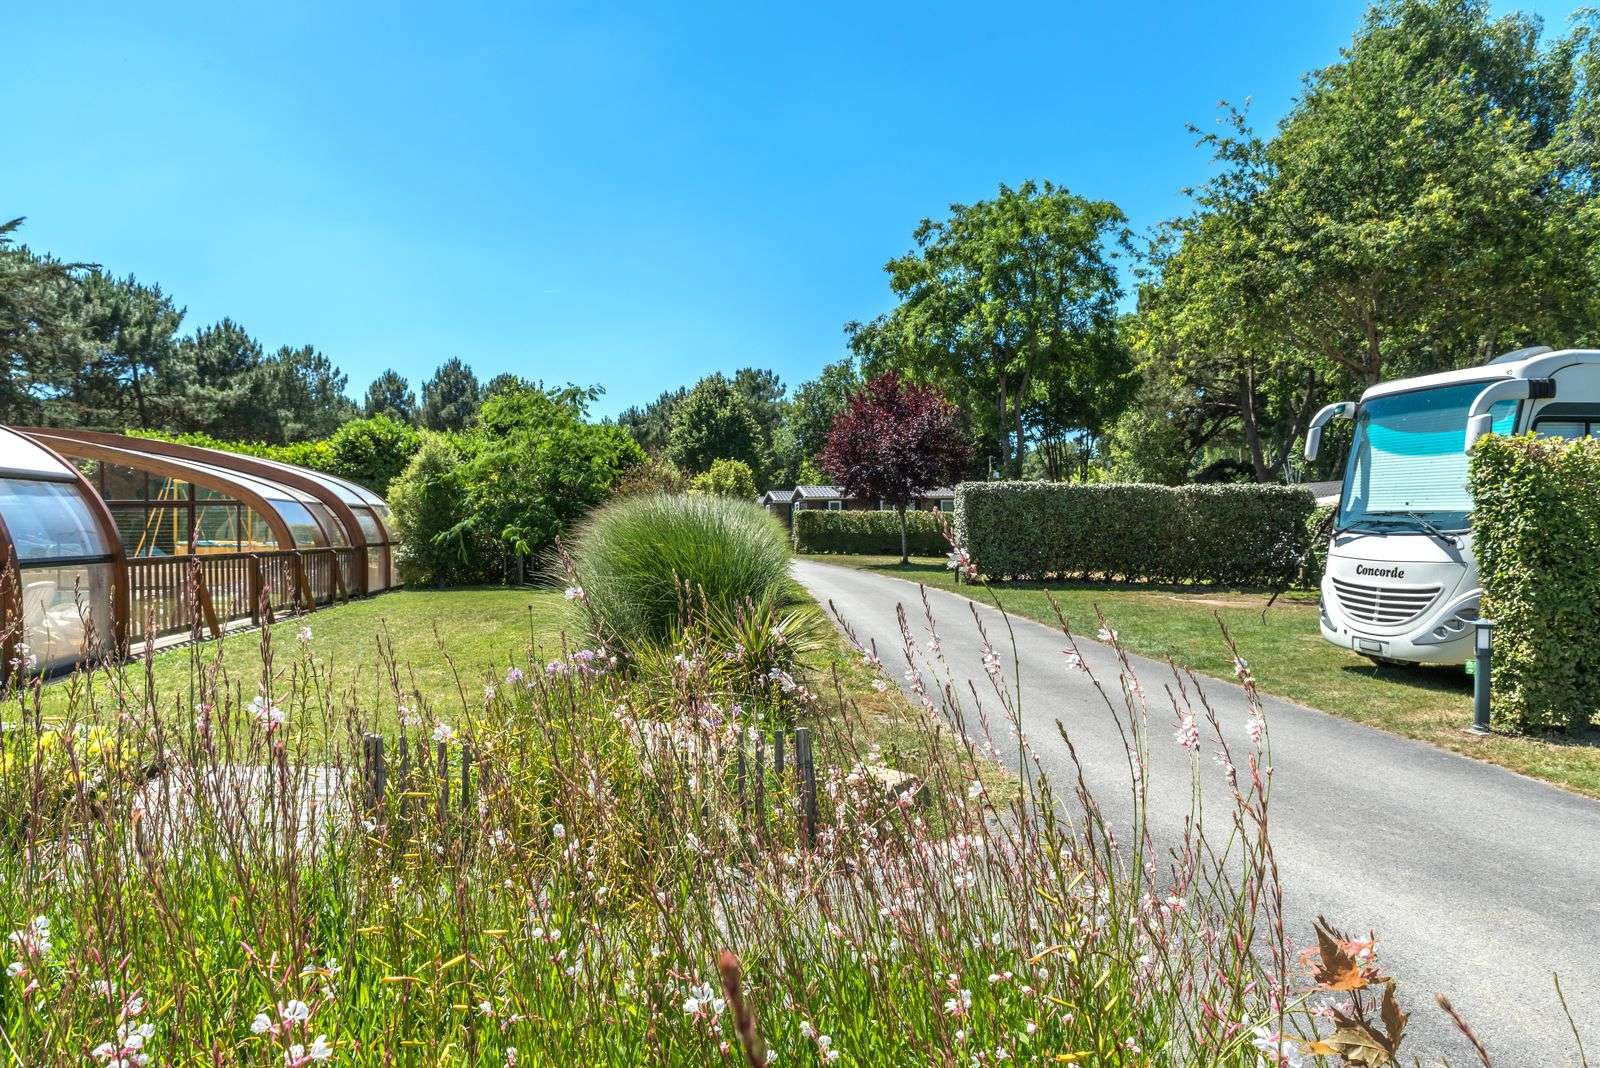 emplacement-camping-car_piscine_hebergement_hotellerie-de-plein-air_camping-les-bruyeres_carnac